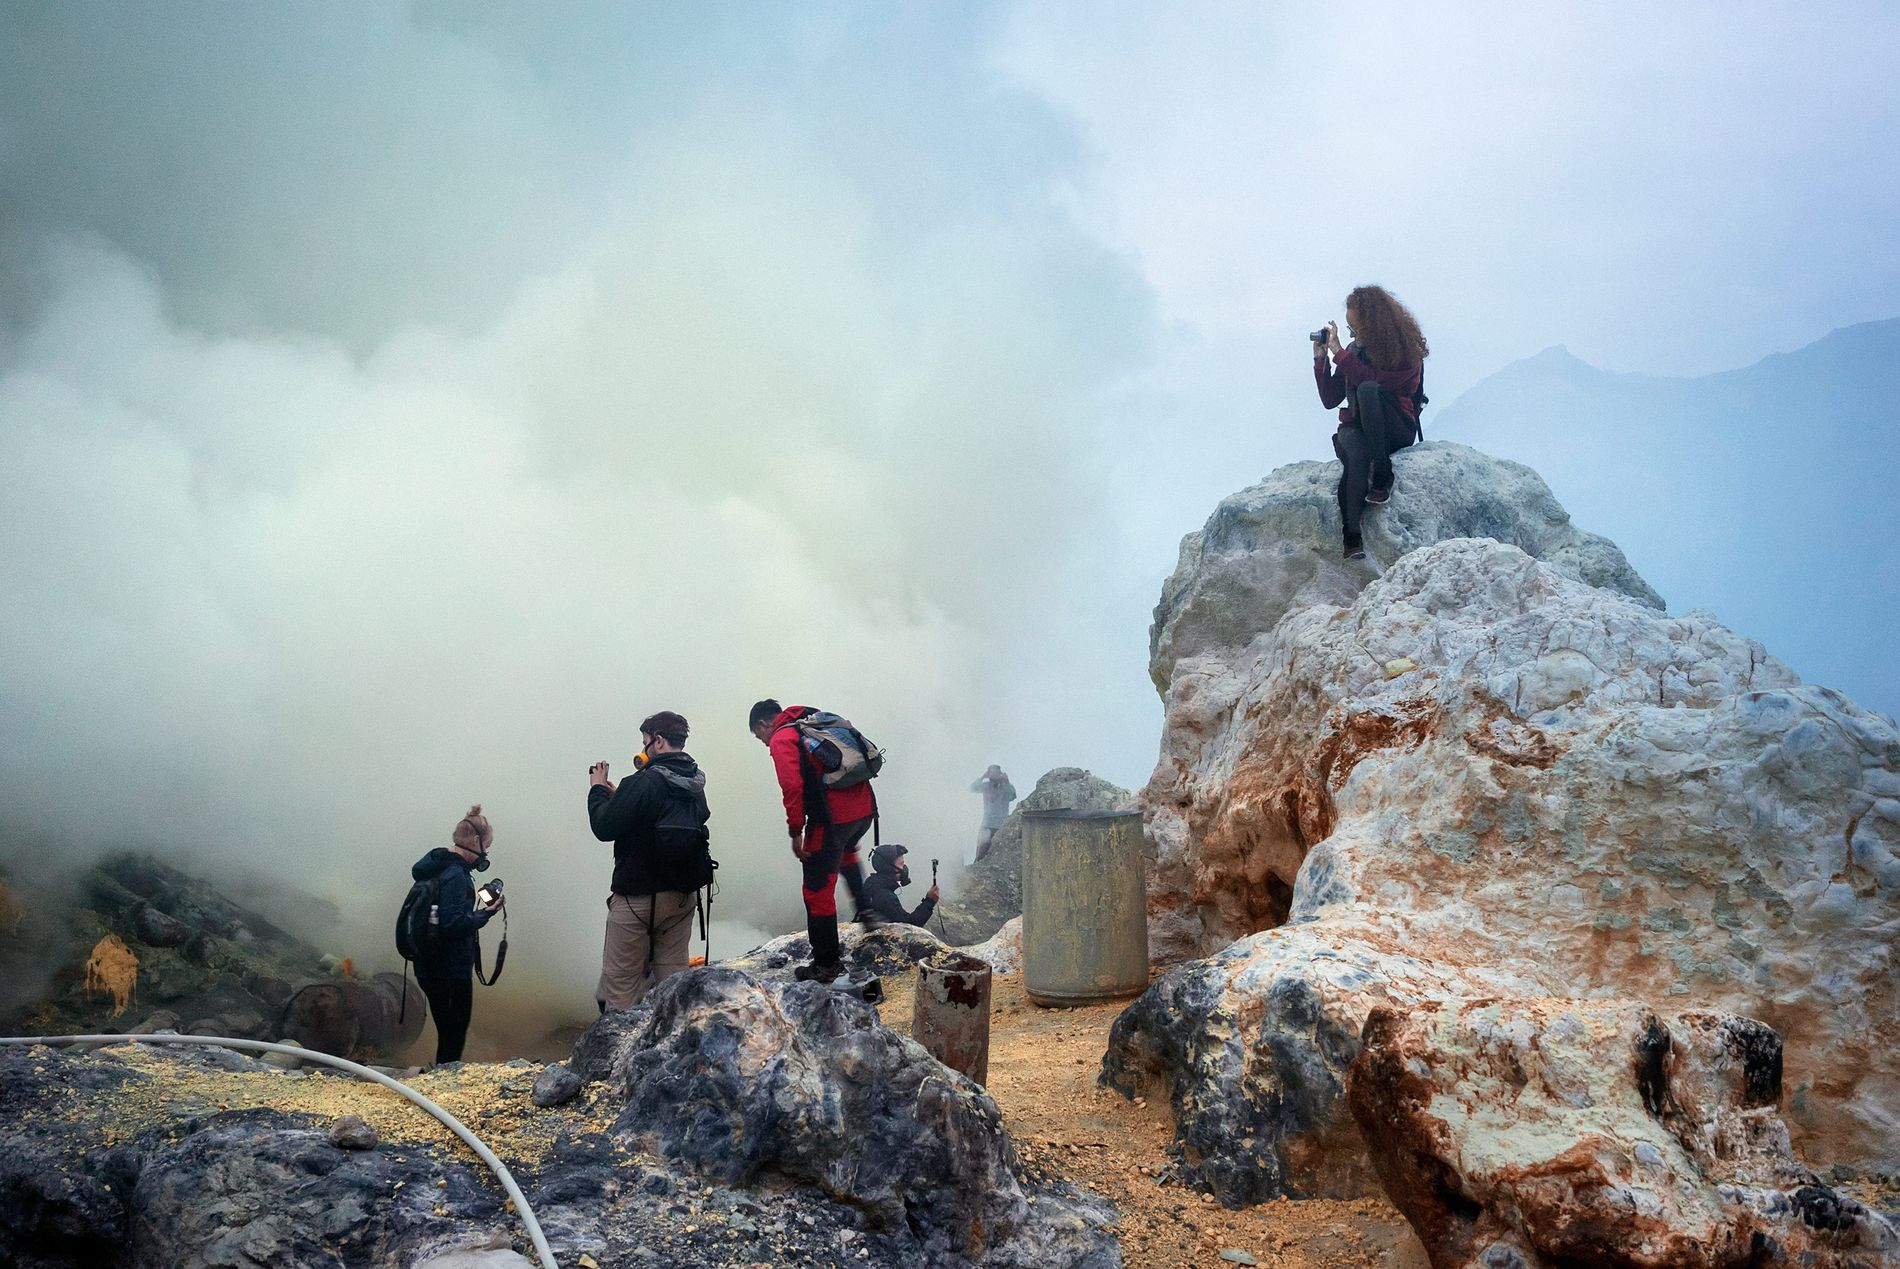 Turistas equipados com máscaras de gás tiram fotos da costa da cratera onde o Lago Cratera ...